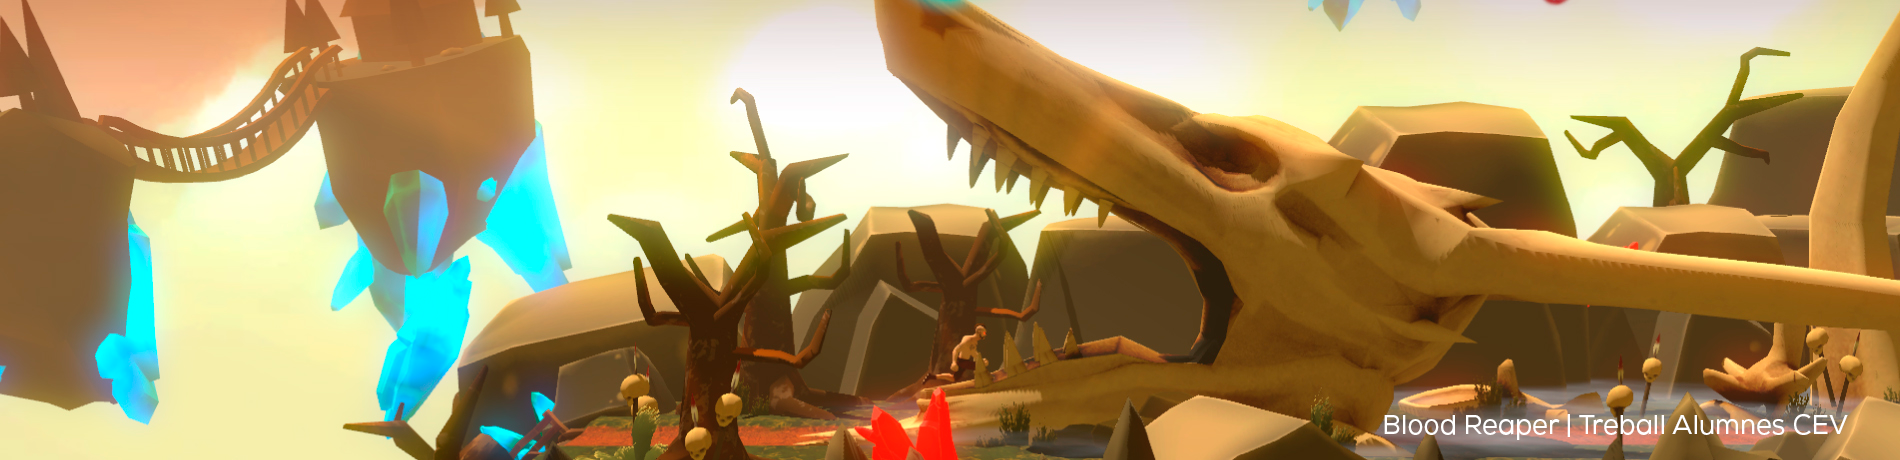 Curs intensiu d'estiu de Game Design